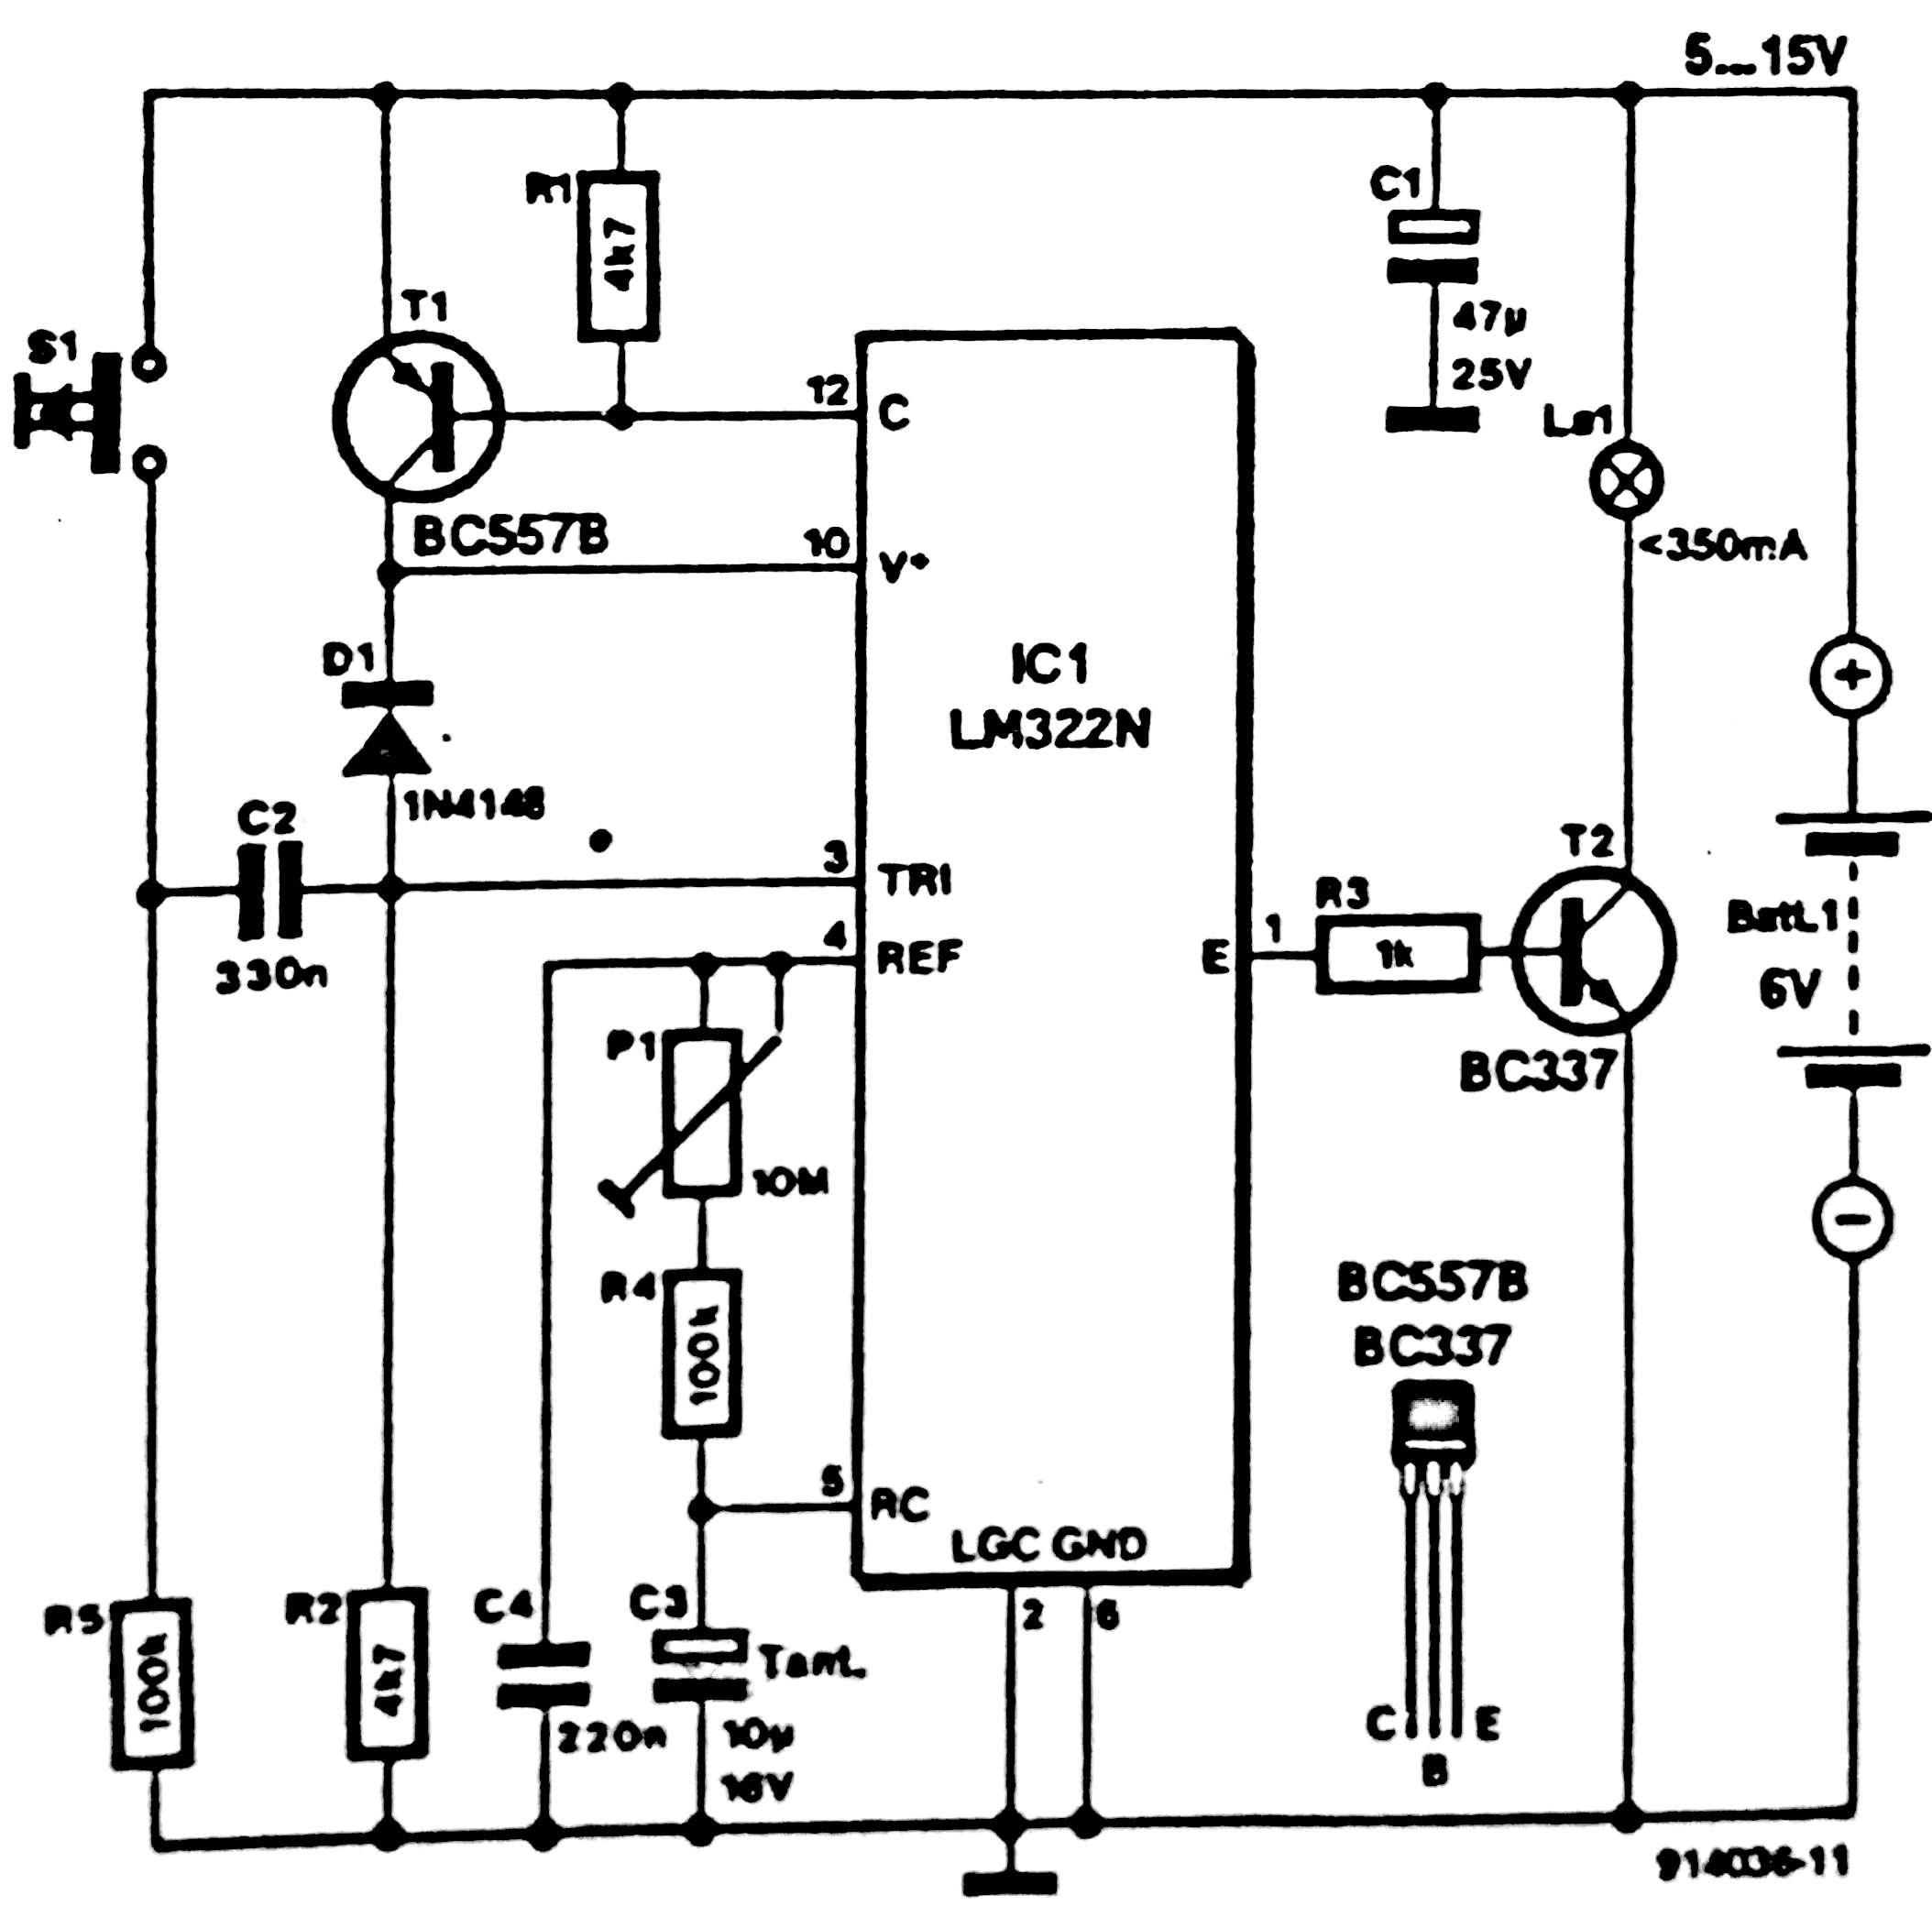 Auto Power off for Audio Equipments Circuit Diagram